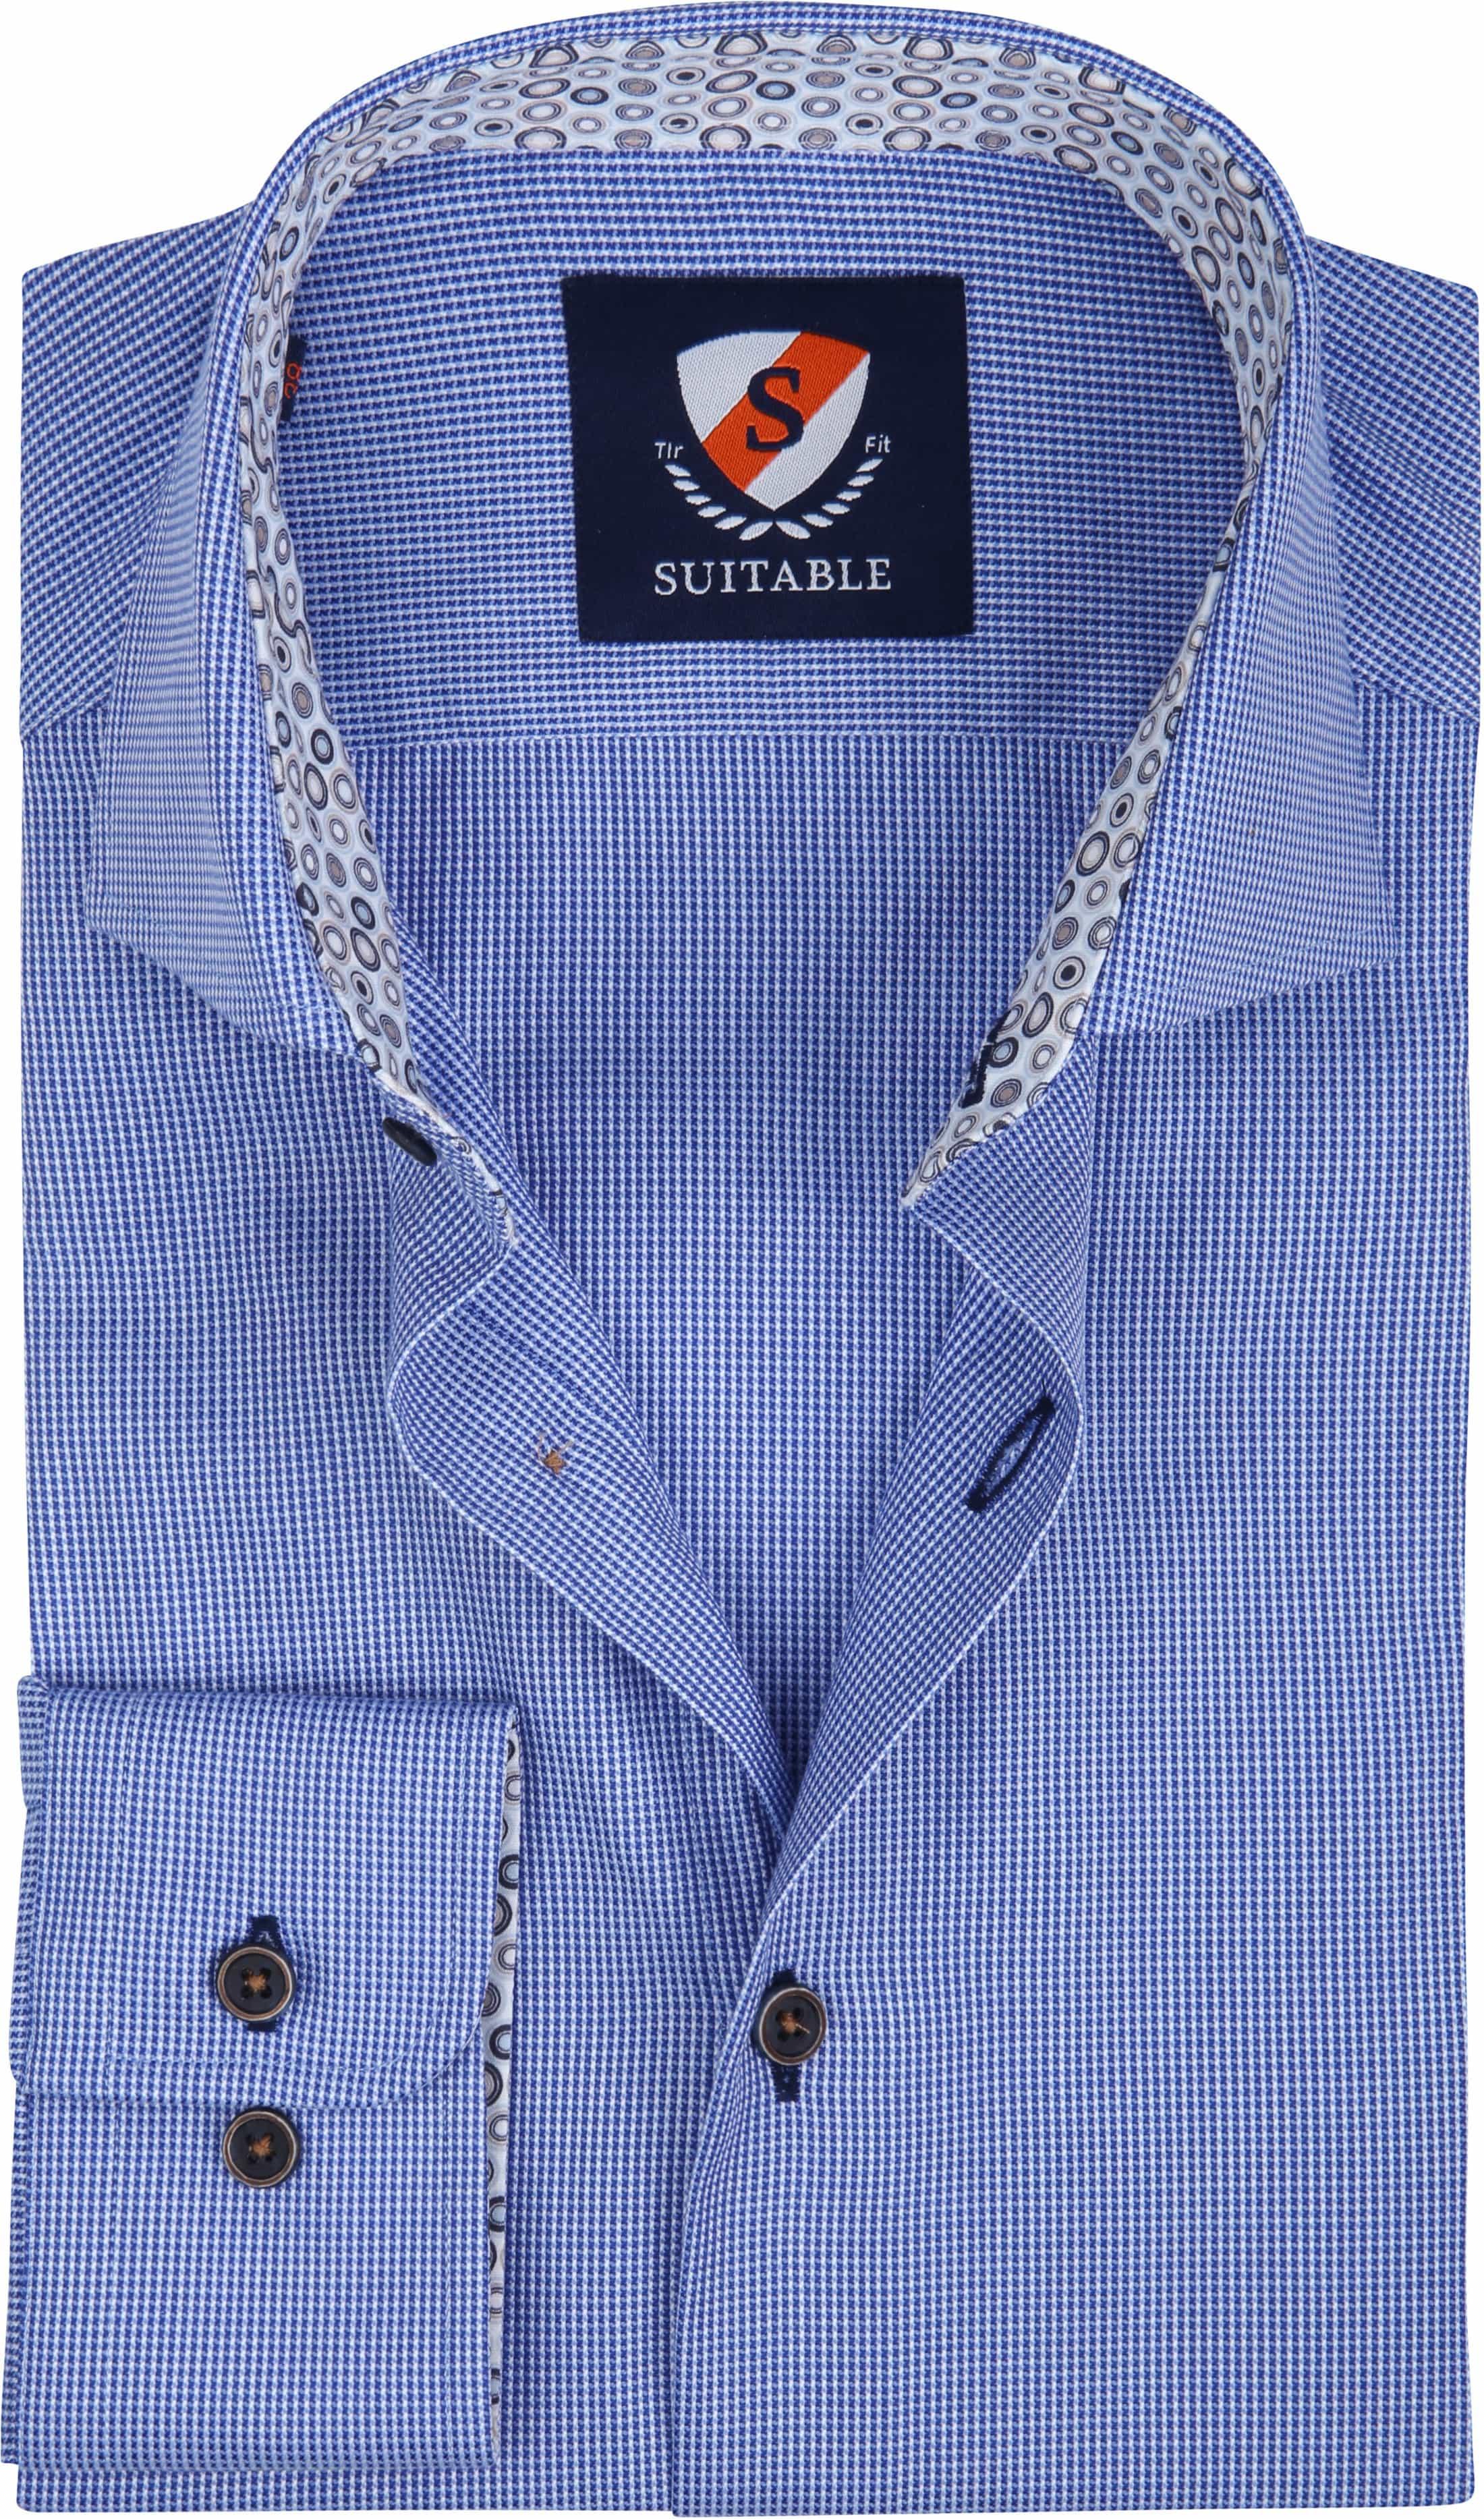 Suitable Overhemd Wesley Blauw foto 0